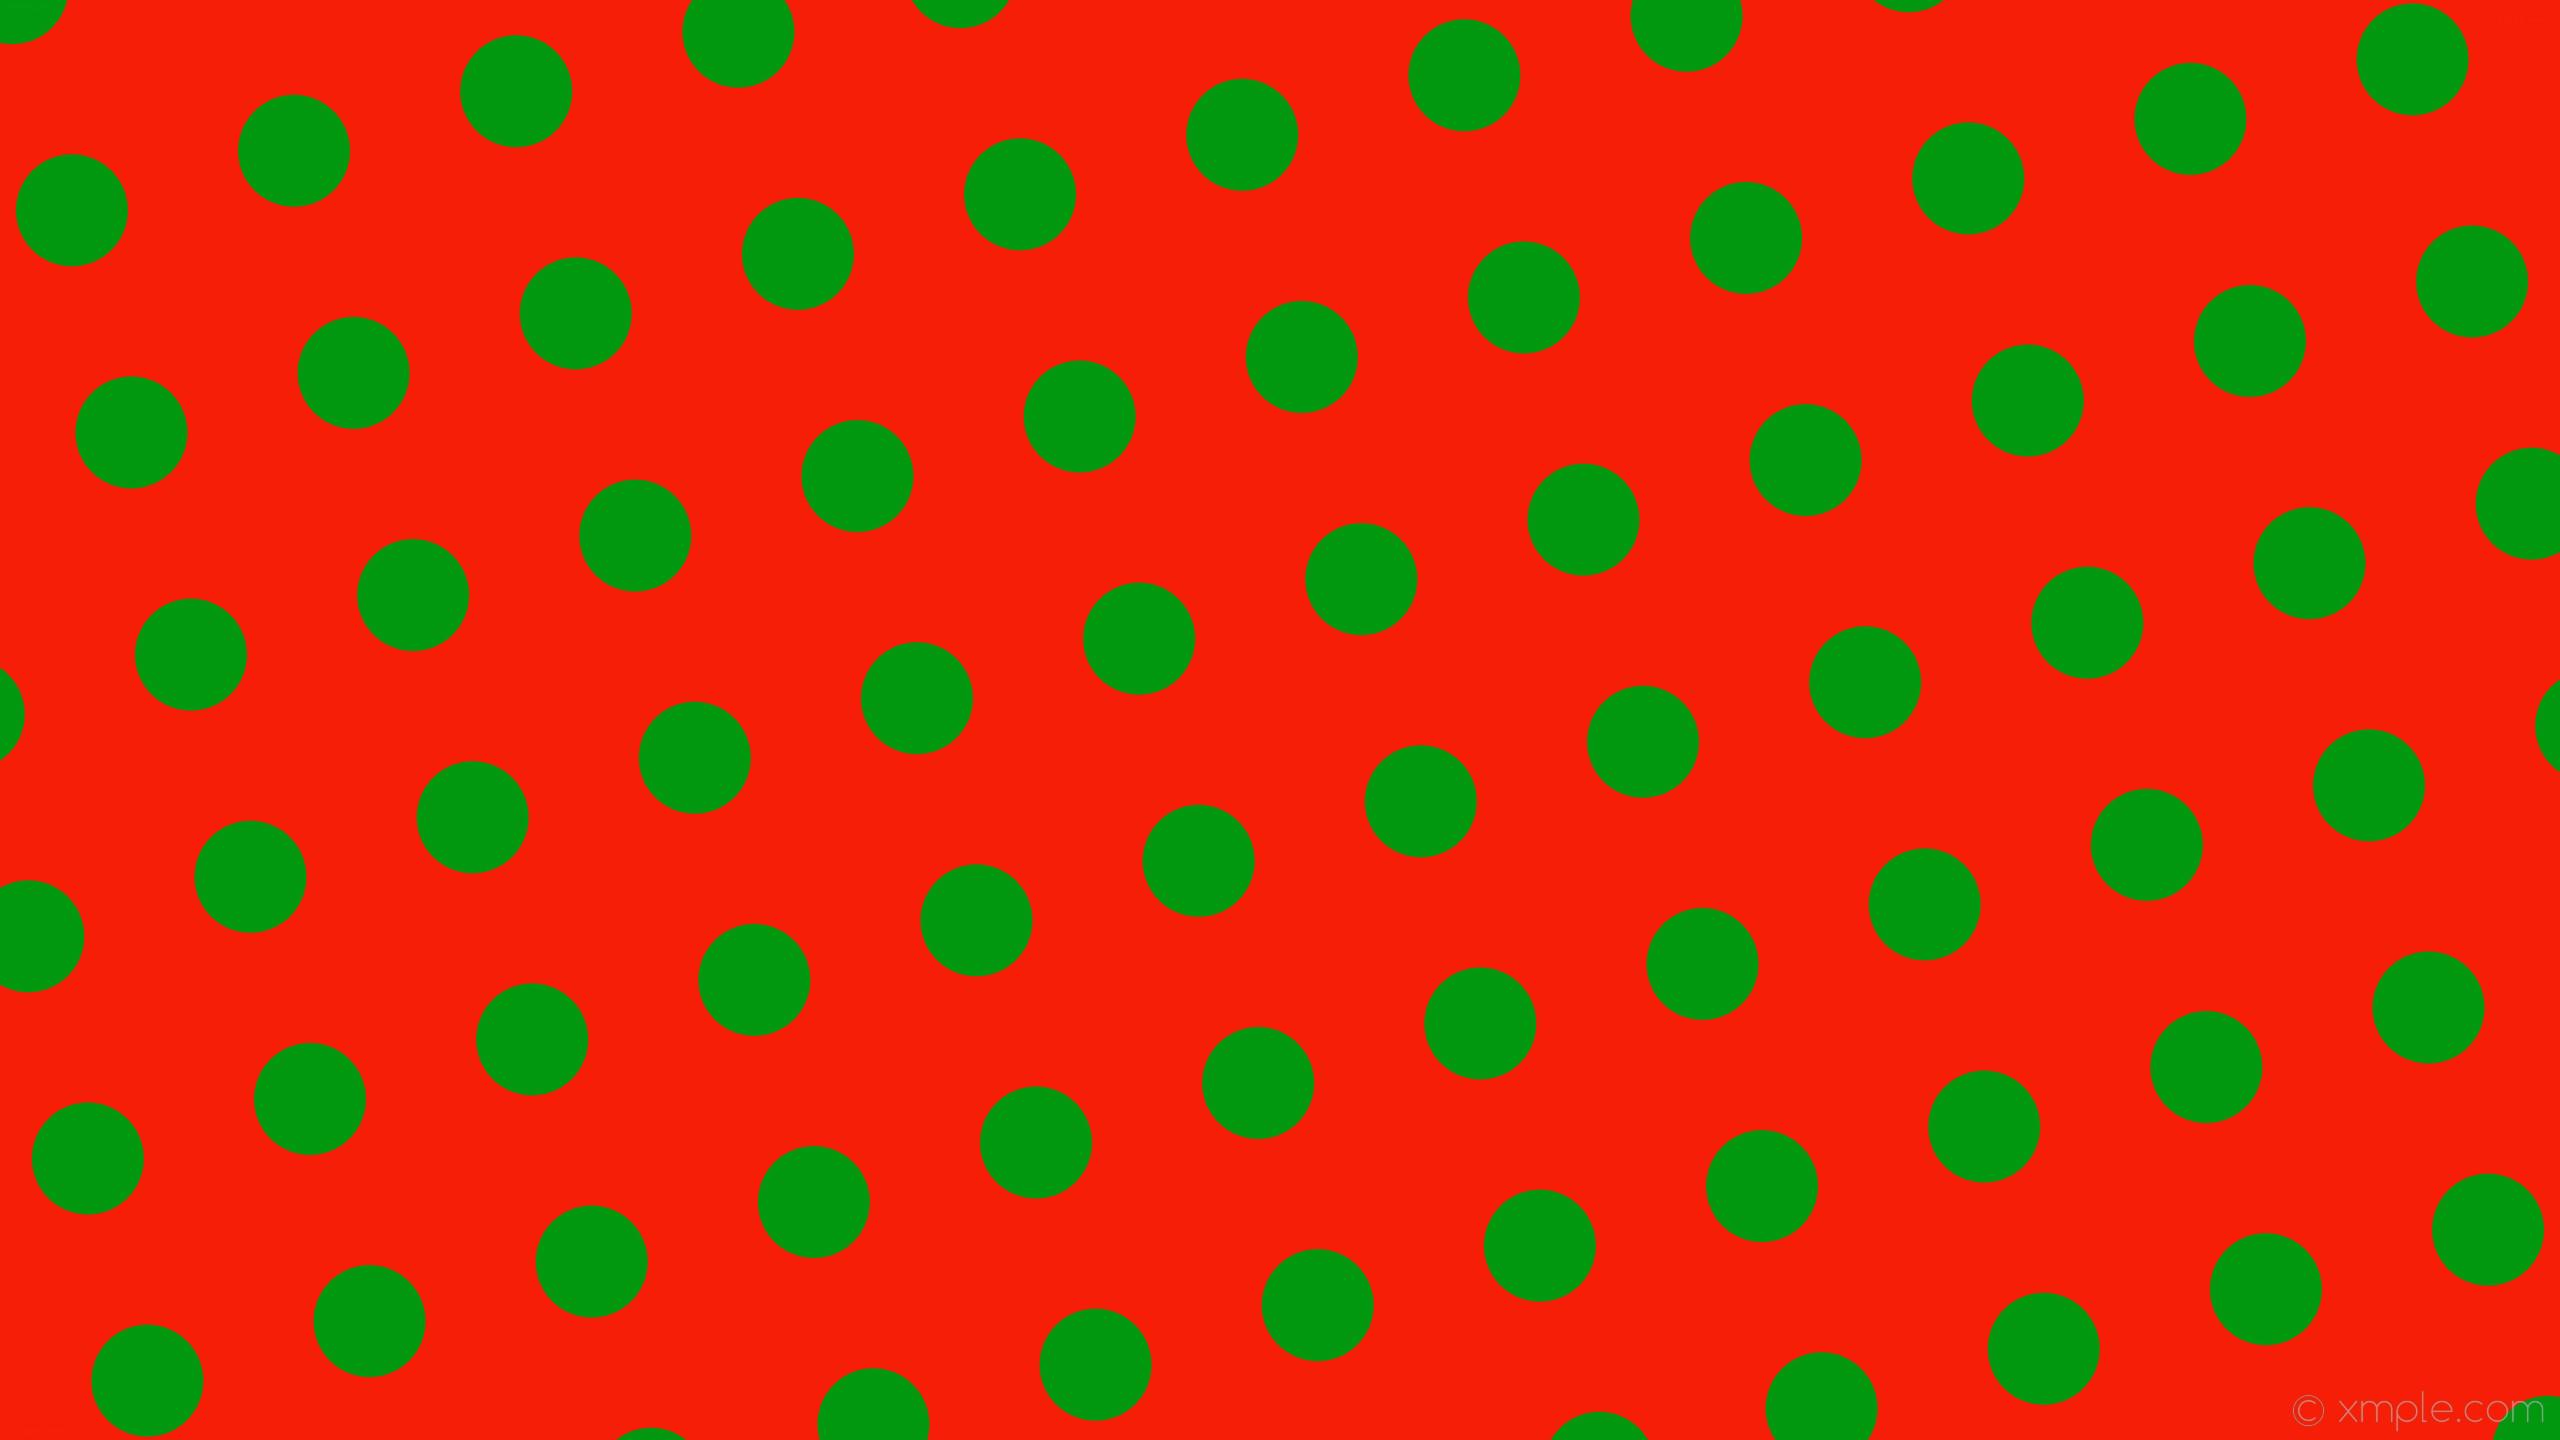 wallpaper red polka dots green spots #f61e06 #01980f 285° 112px 230px